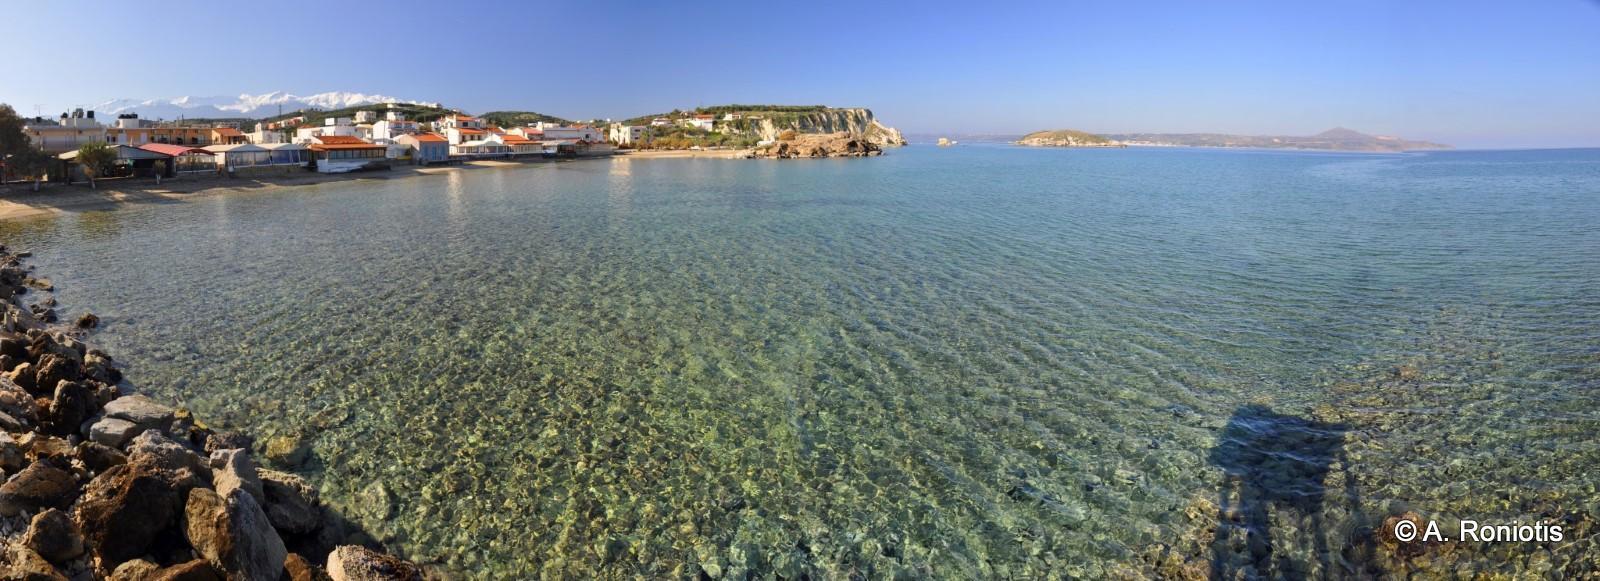 Картинки по запросу фото море в Алмерида